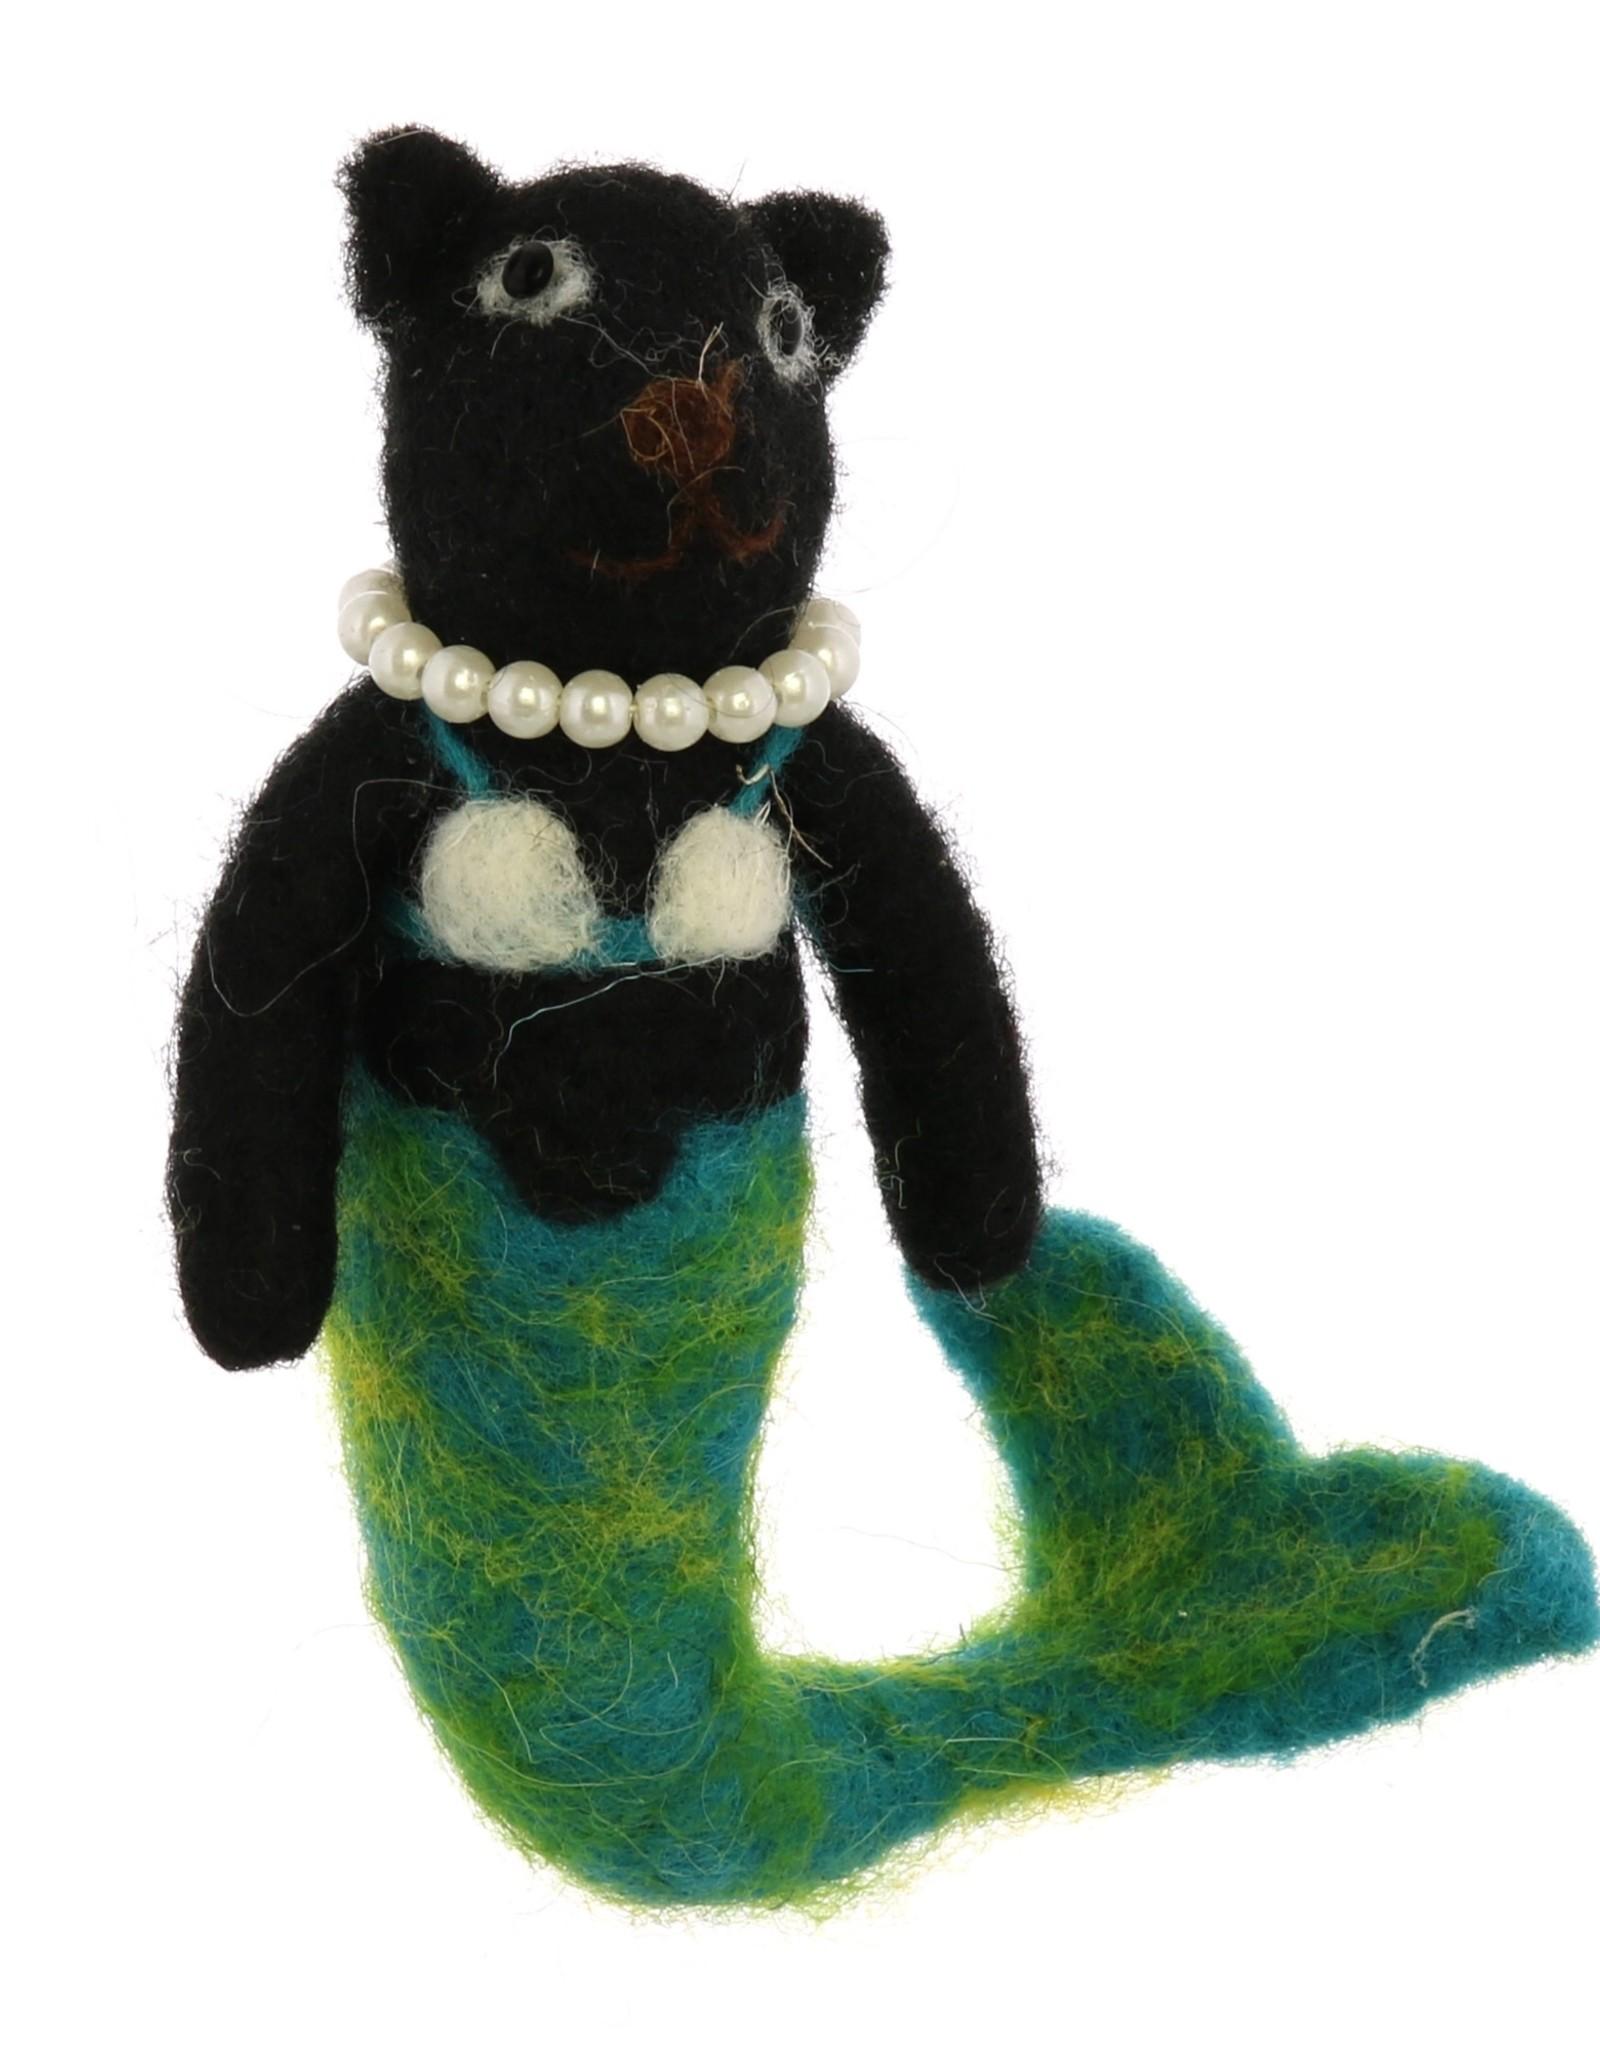 Mermaid Cat Ornament - Black